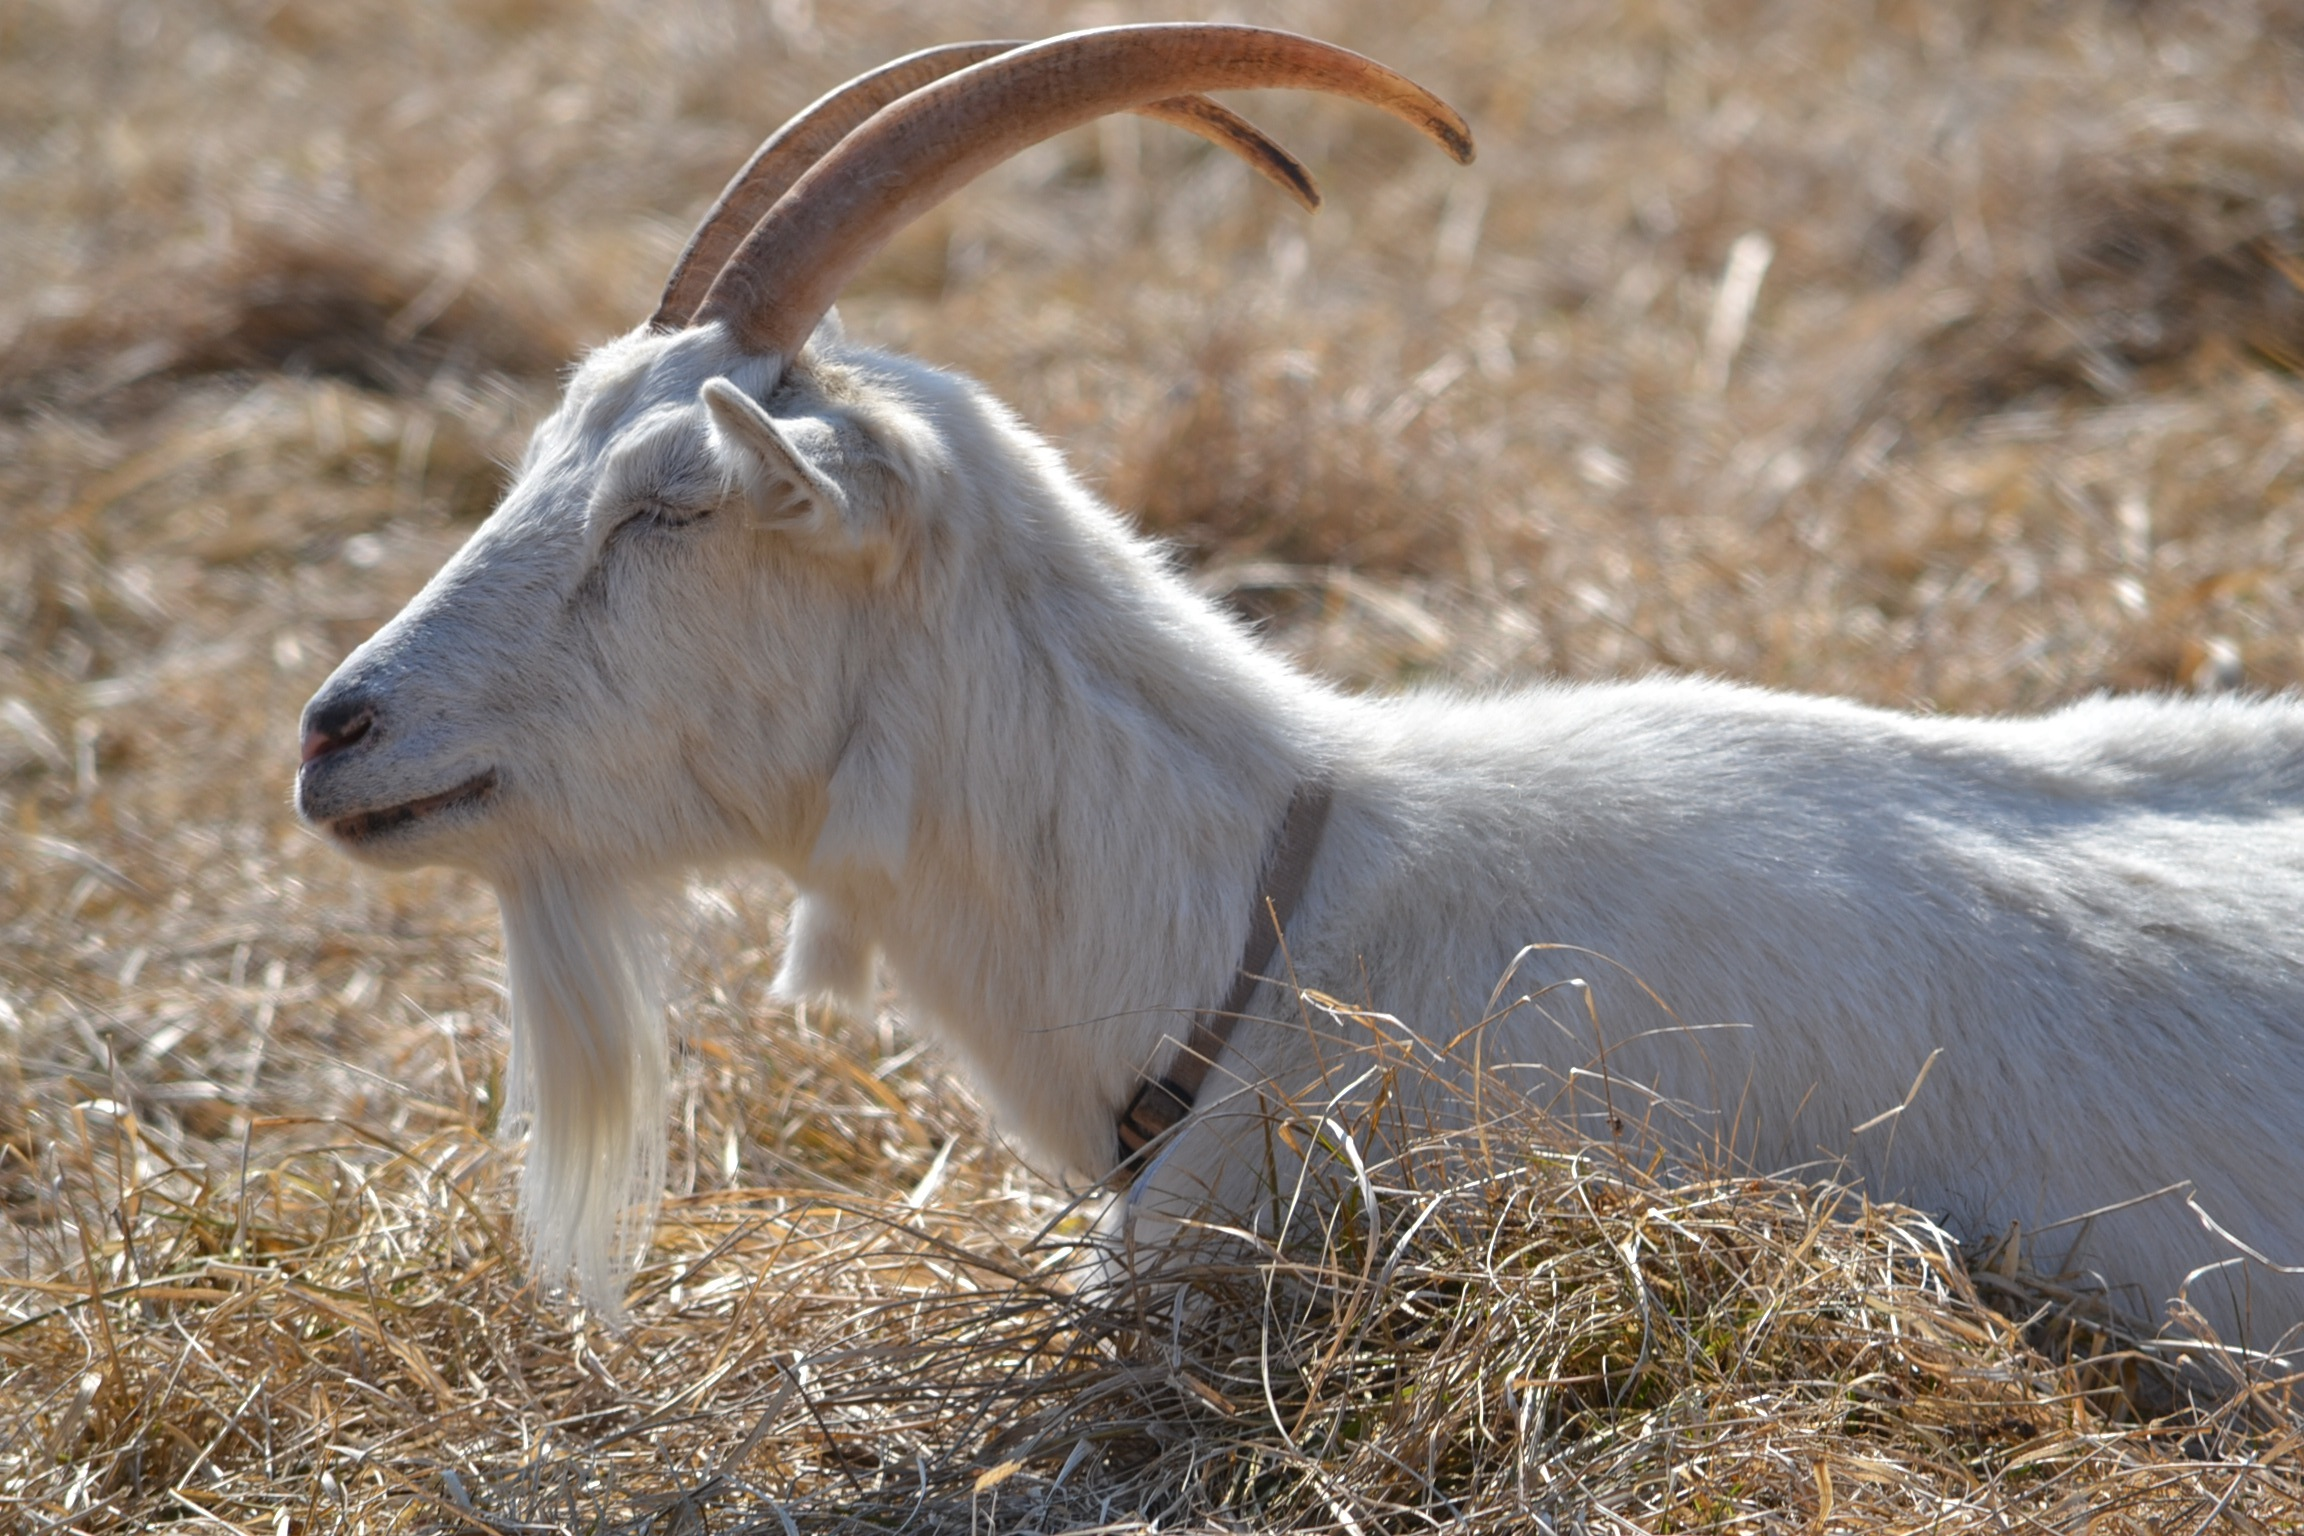 Wattles and Goat Genetics